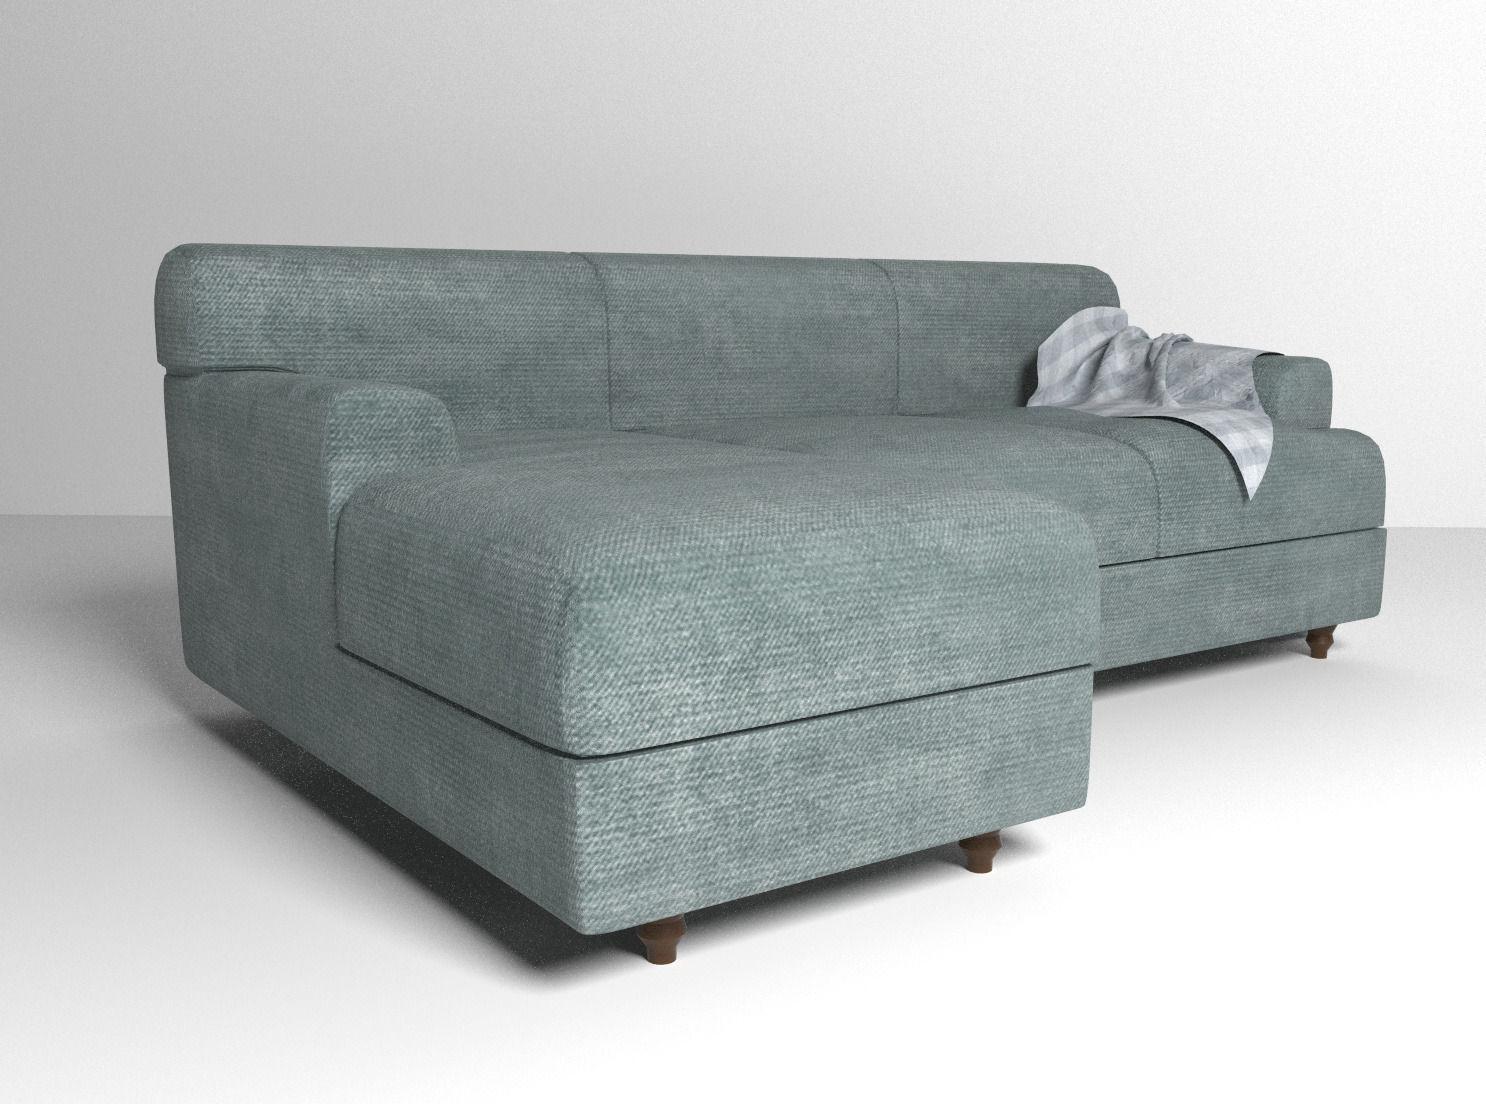 Velvet fabric sofa 3D Model MAX OBJ 3DS FBX CGTradercom : velvetfabricsofa3dmodel3dsfbxobj52ef9154 1c4b 4034 8ff4 8c276422b022 from www.cgtrader.com size 1486 x 1104 jpeg 180kB